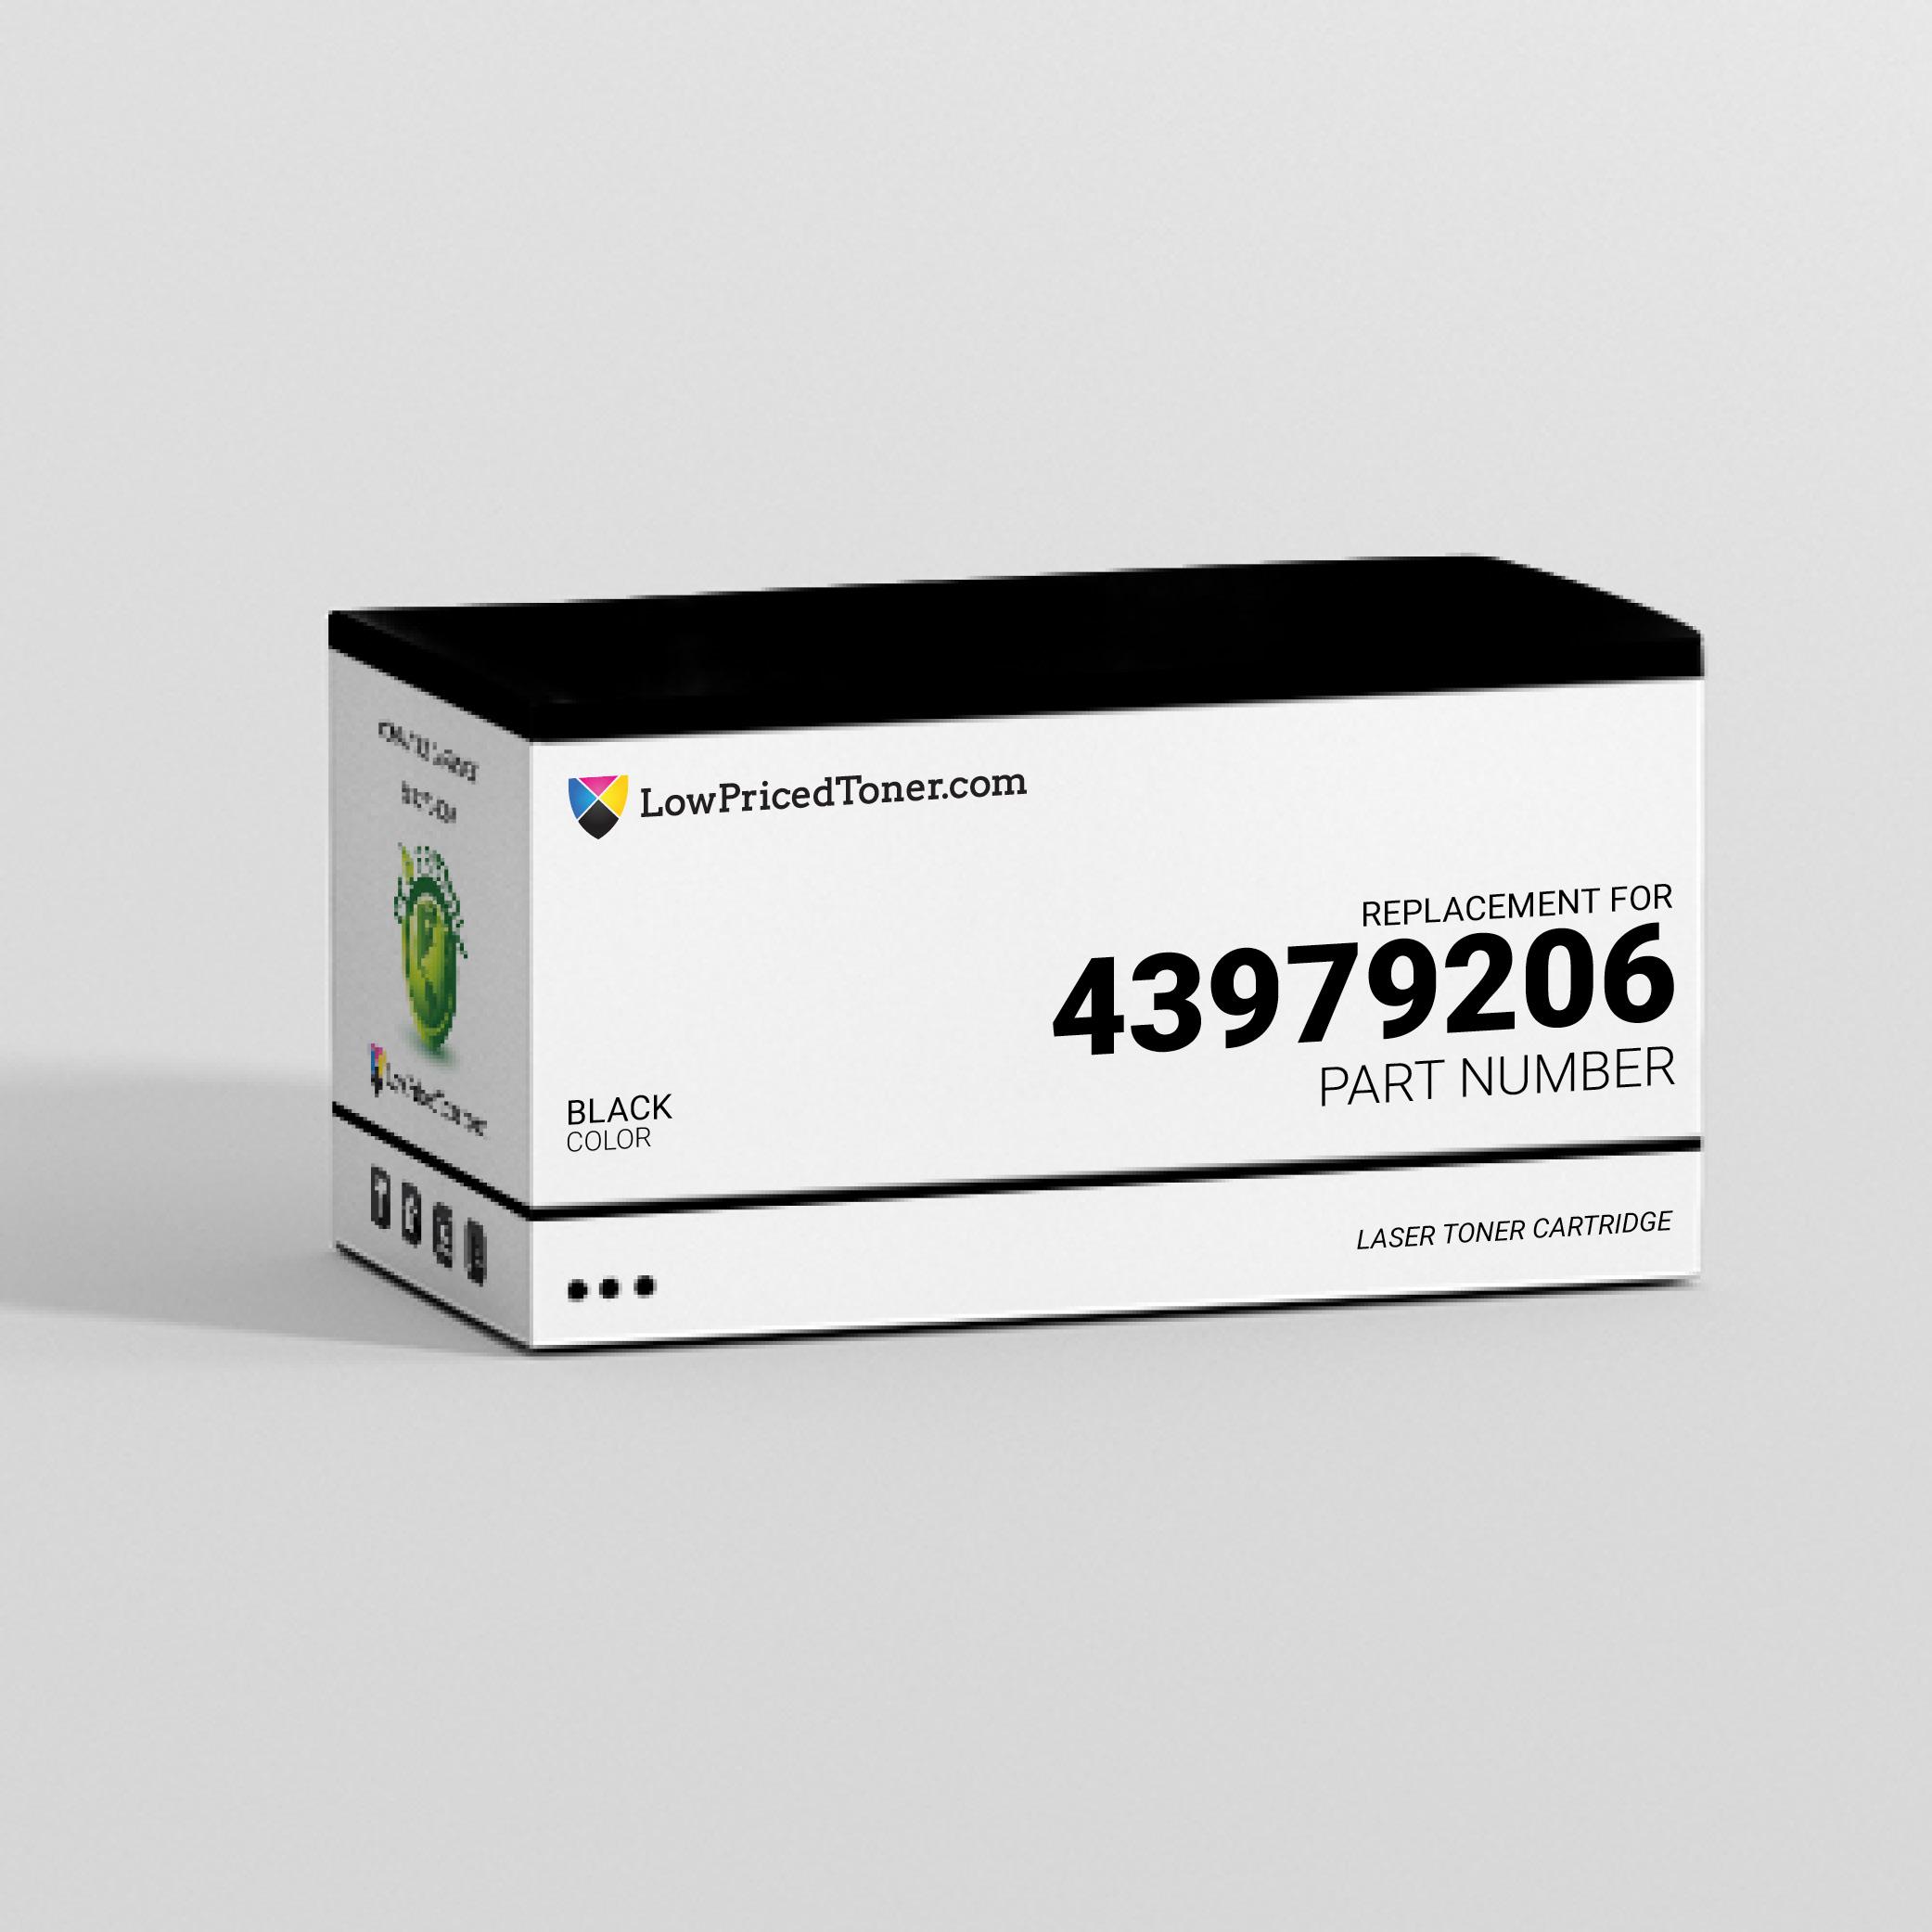 Okidata 43979206 Compatible Black Laser Toner Cartridge